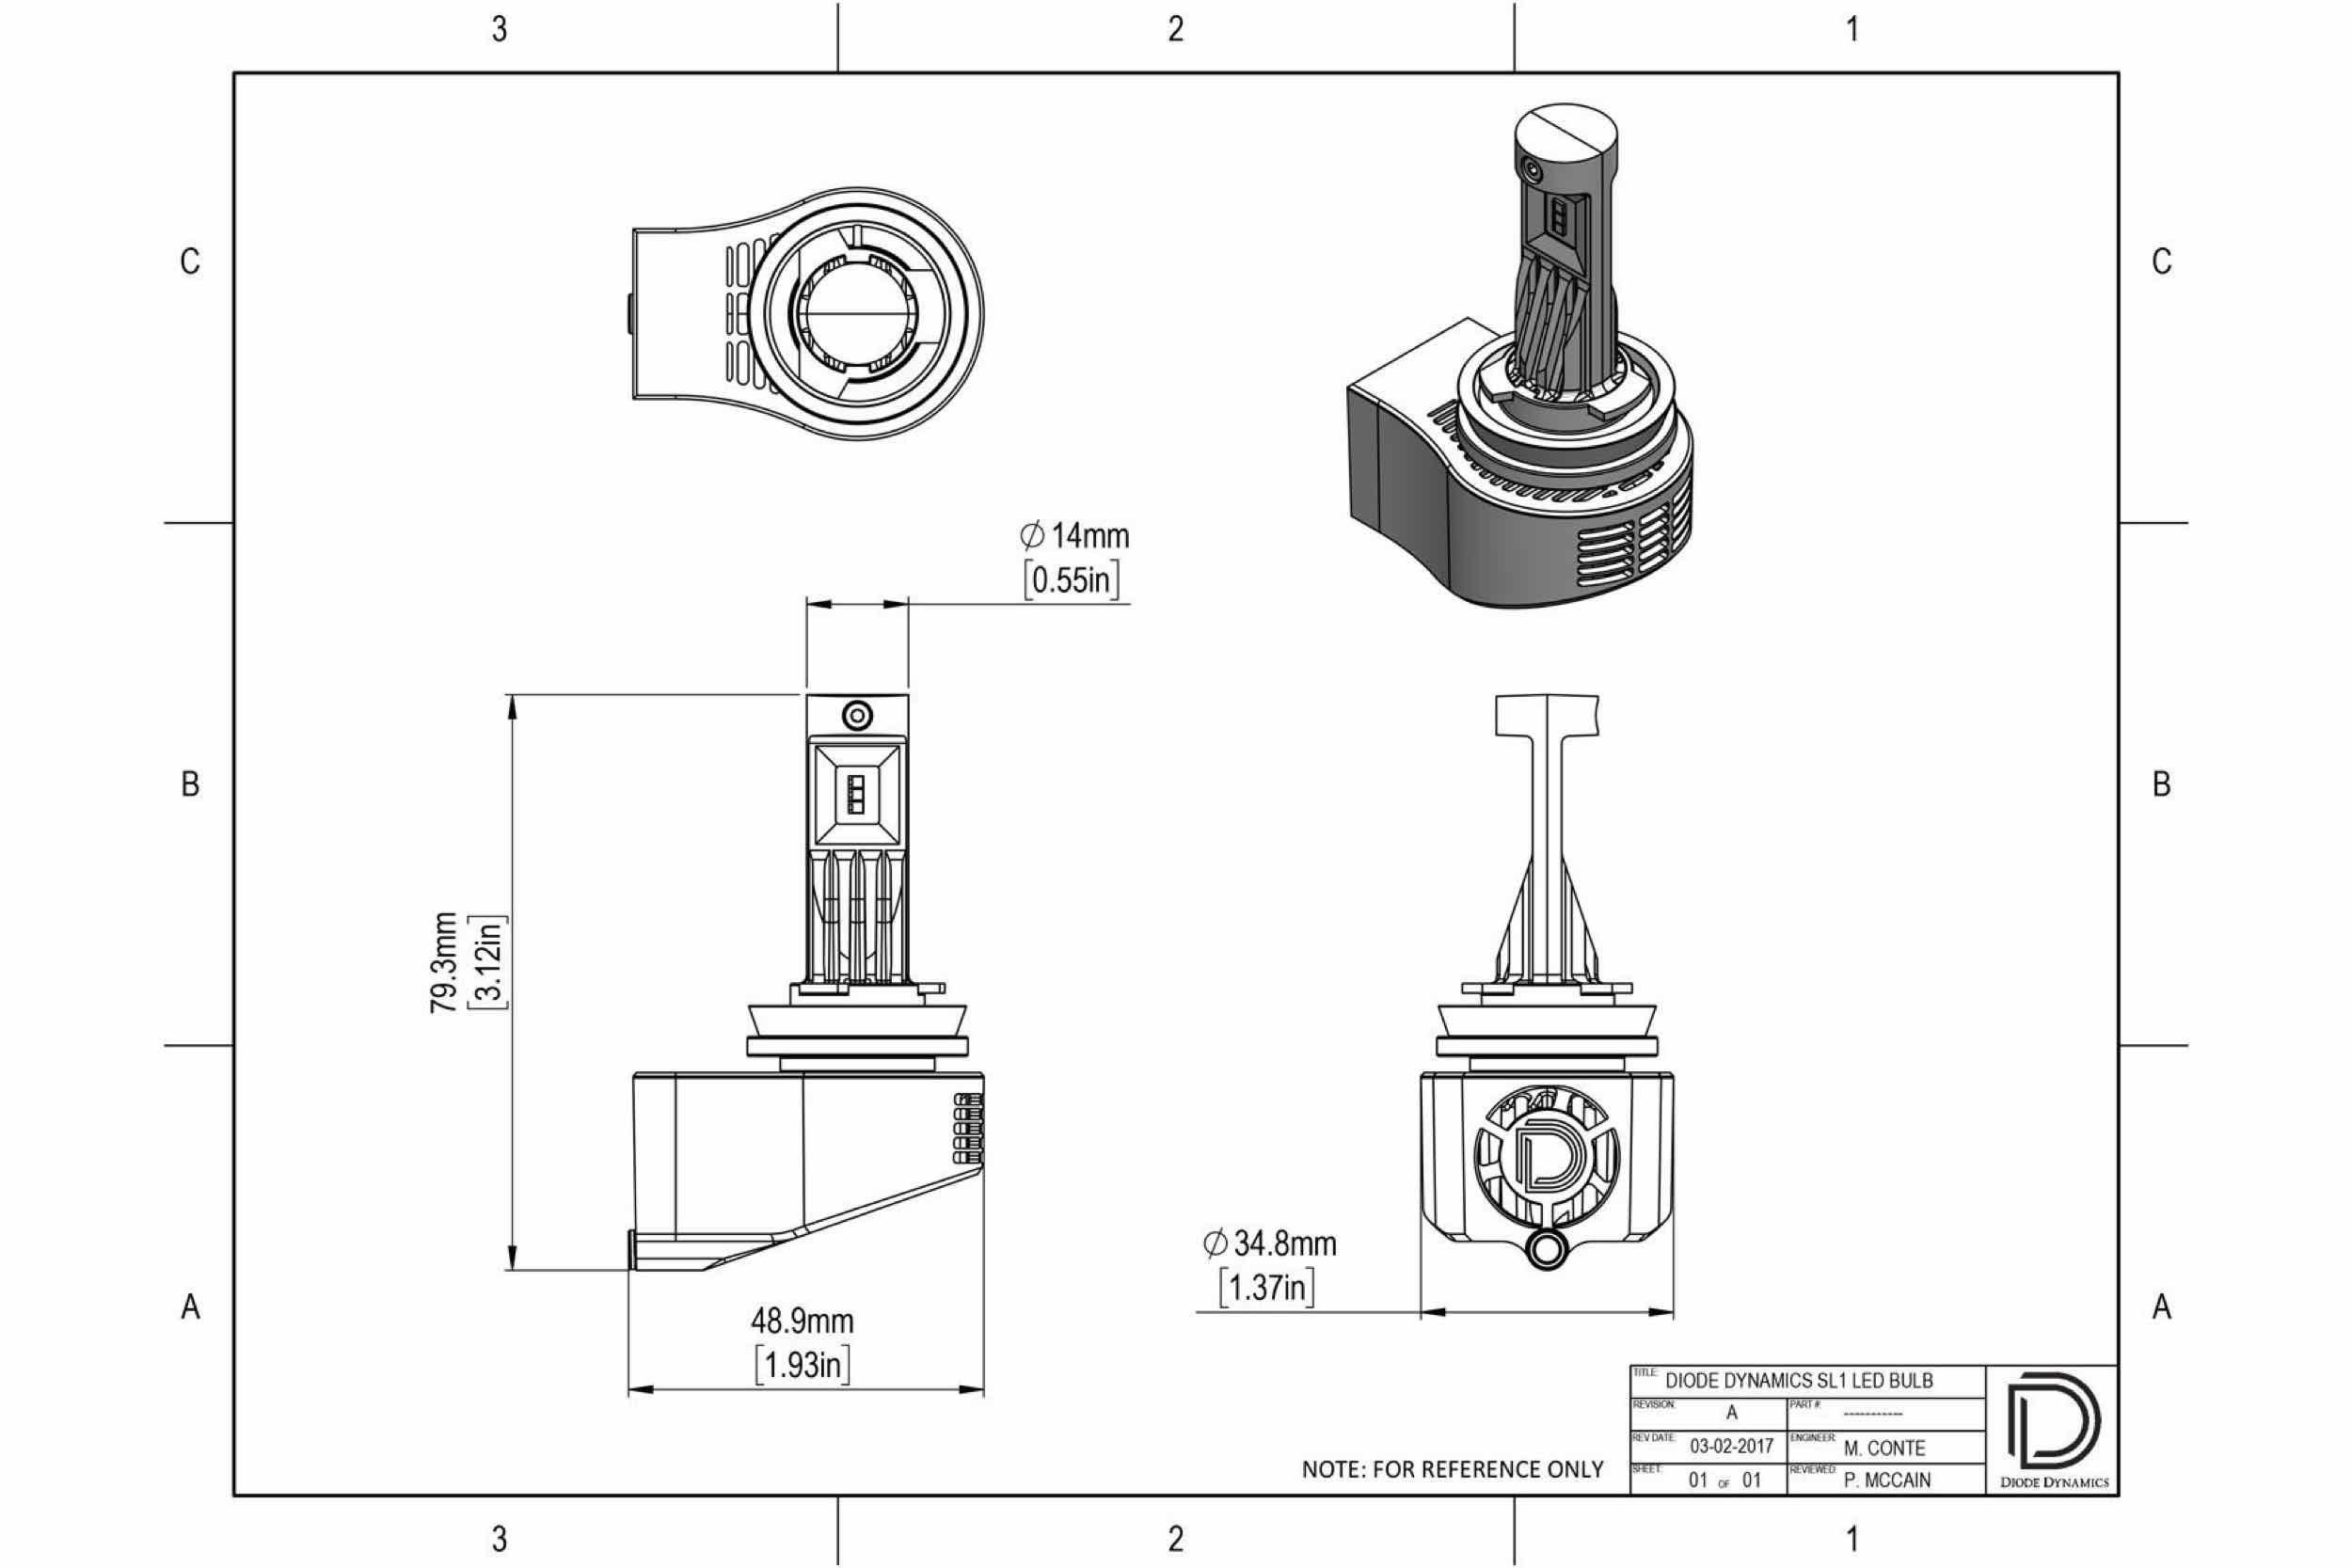 Diode Dynamics SL1 / SLF H10/9145 LED Bulbs I HR